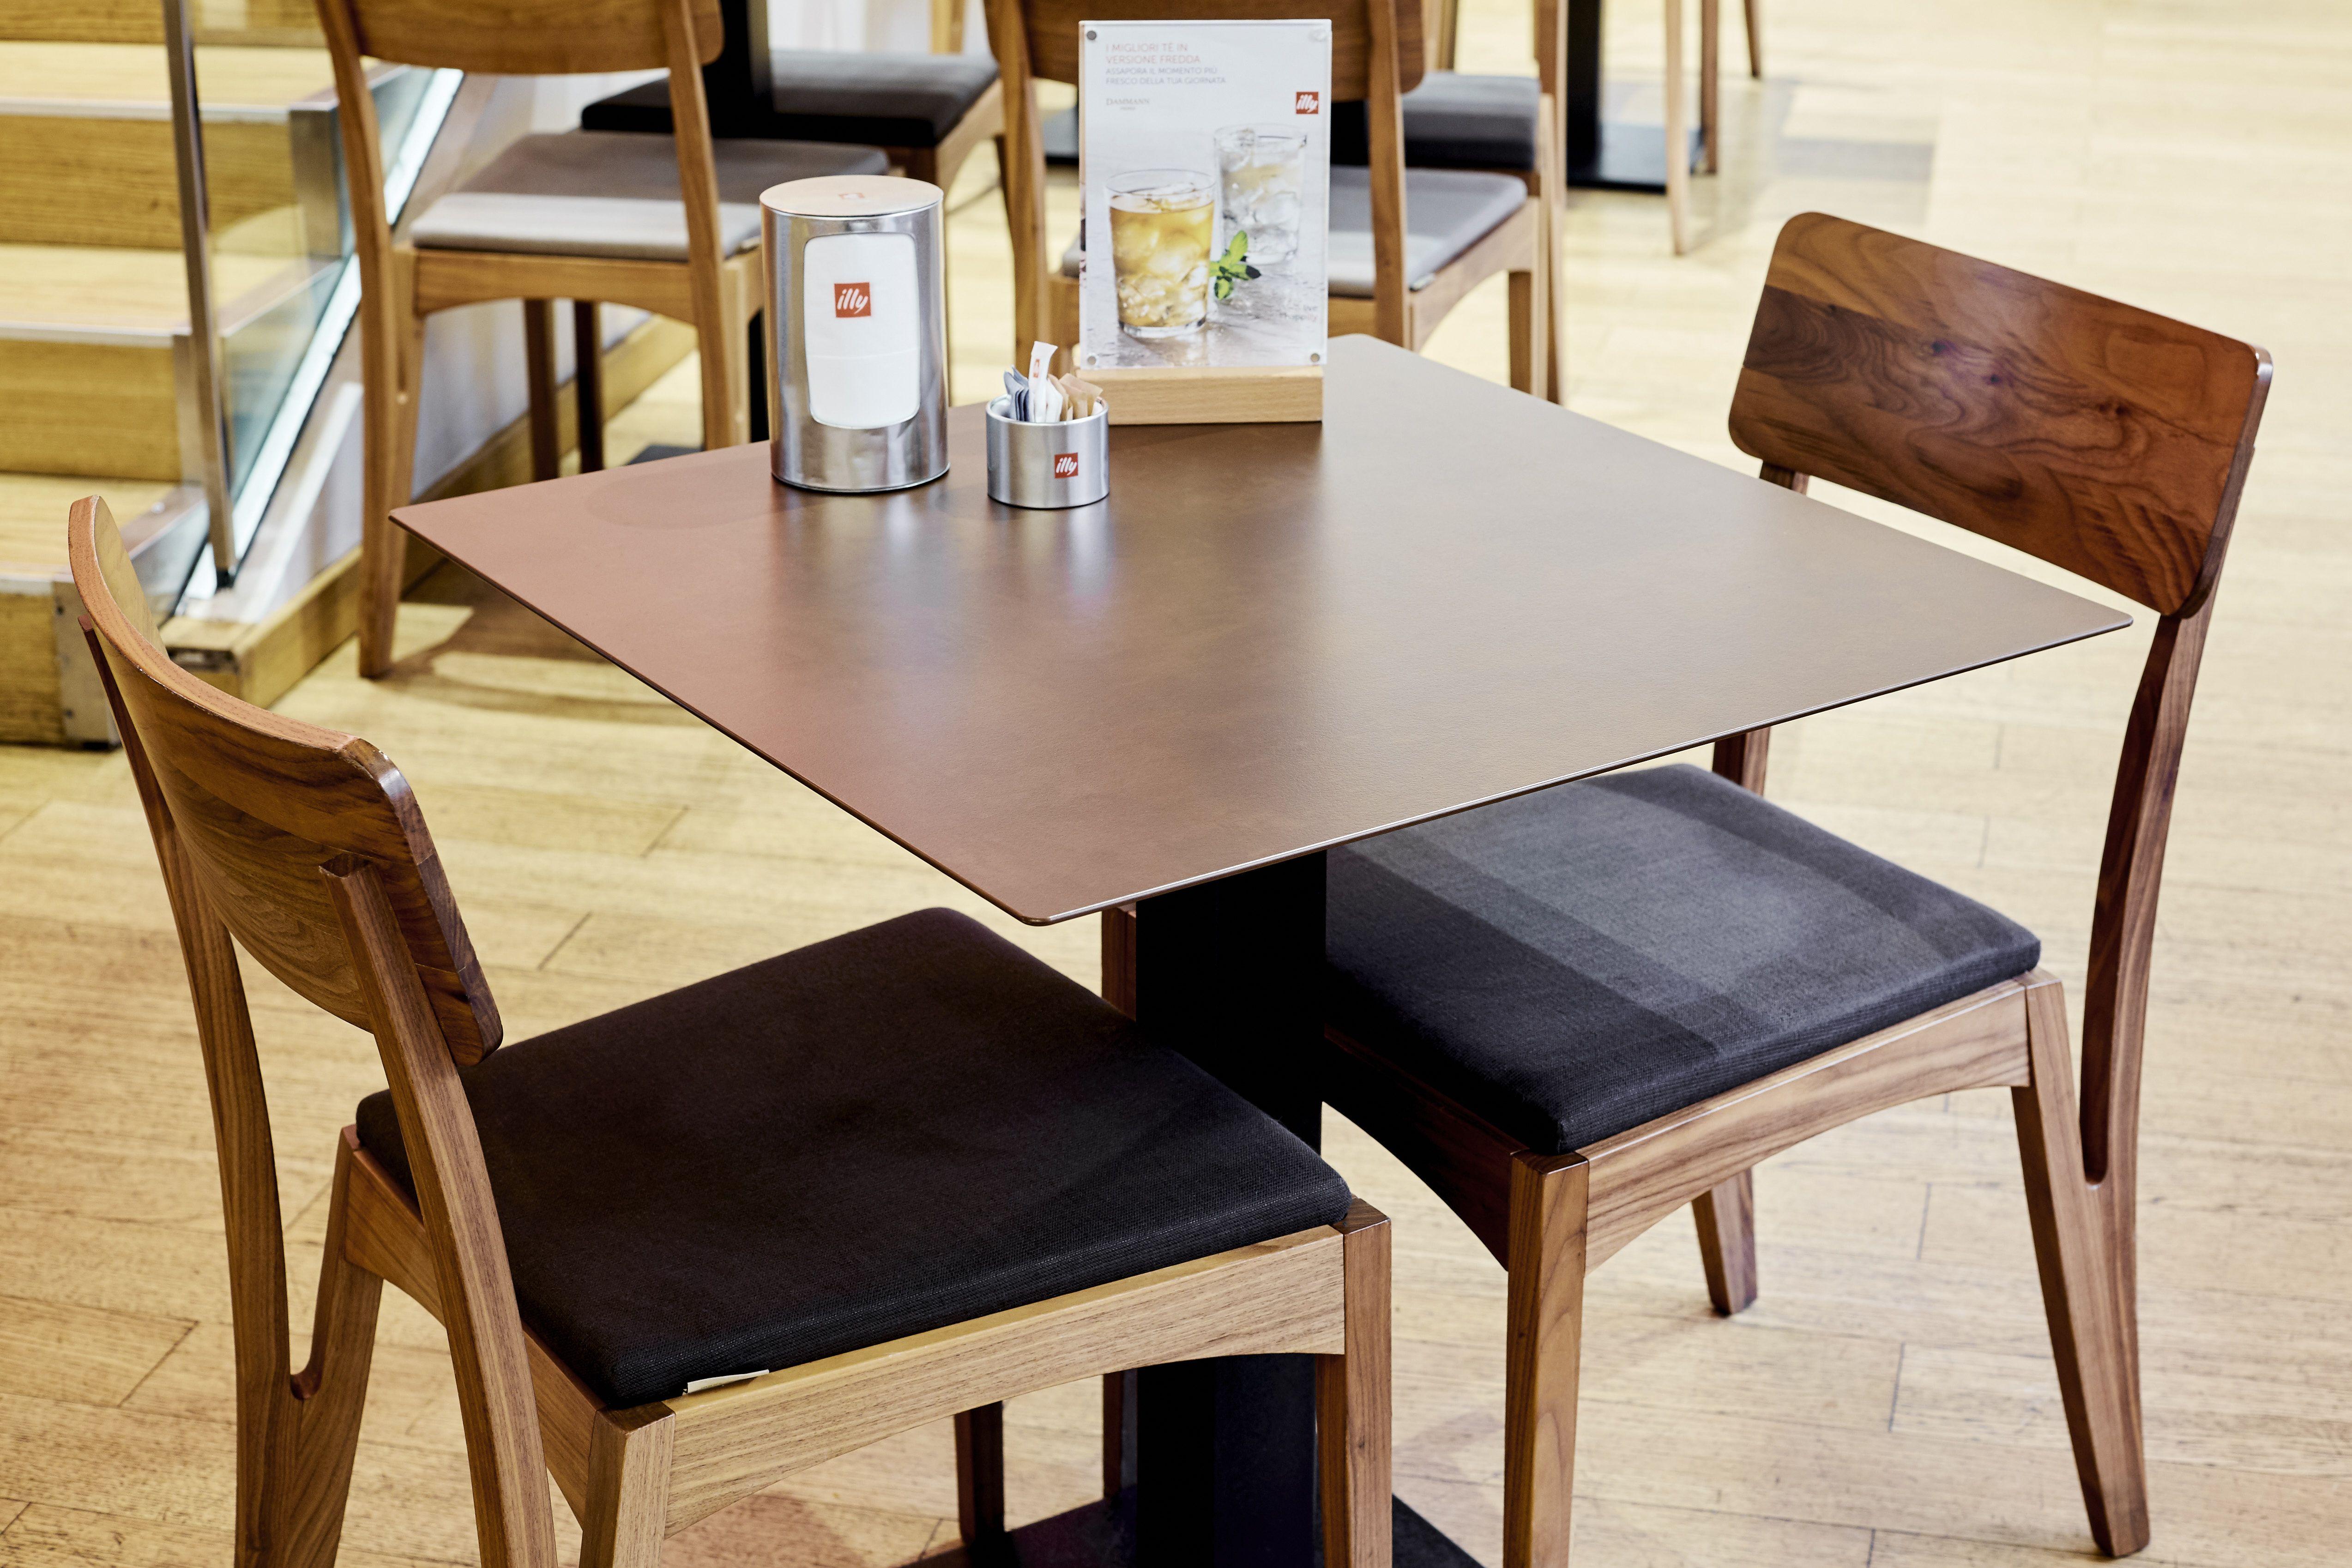 Tavoli Sedie Sgabelli.Ristorante Mobili Arredamento Tavoli Sedie Sgabelli